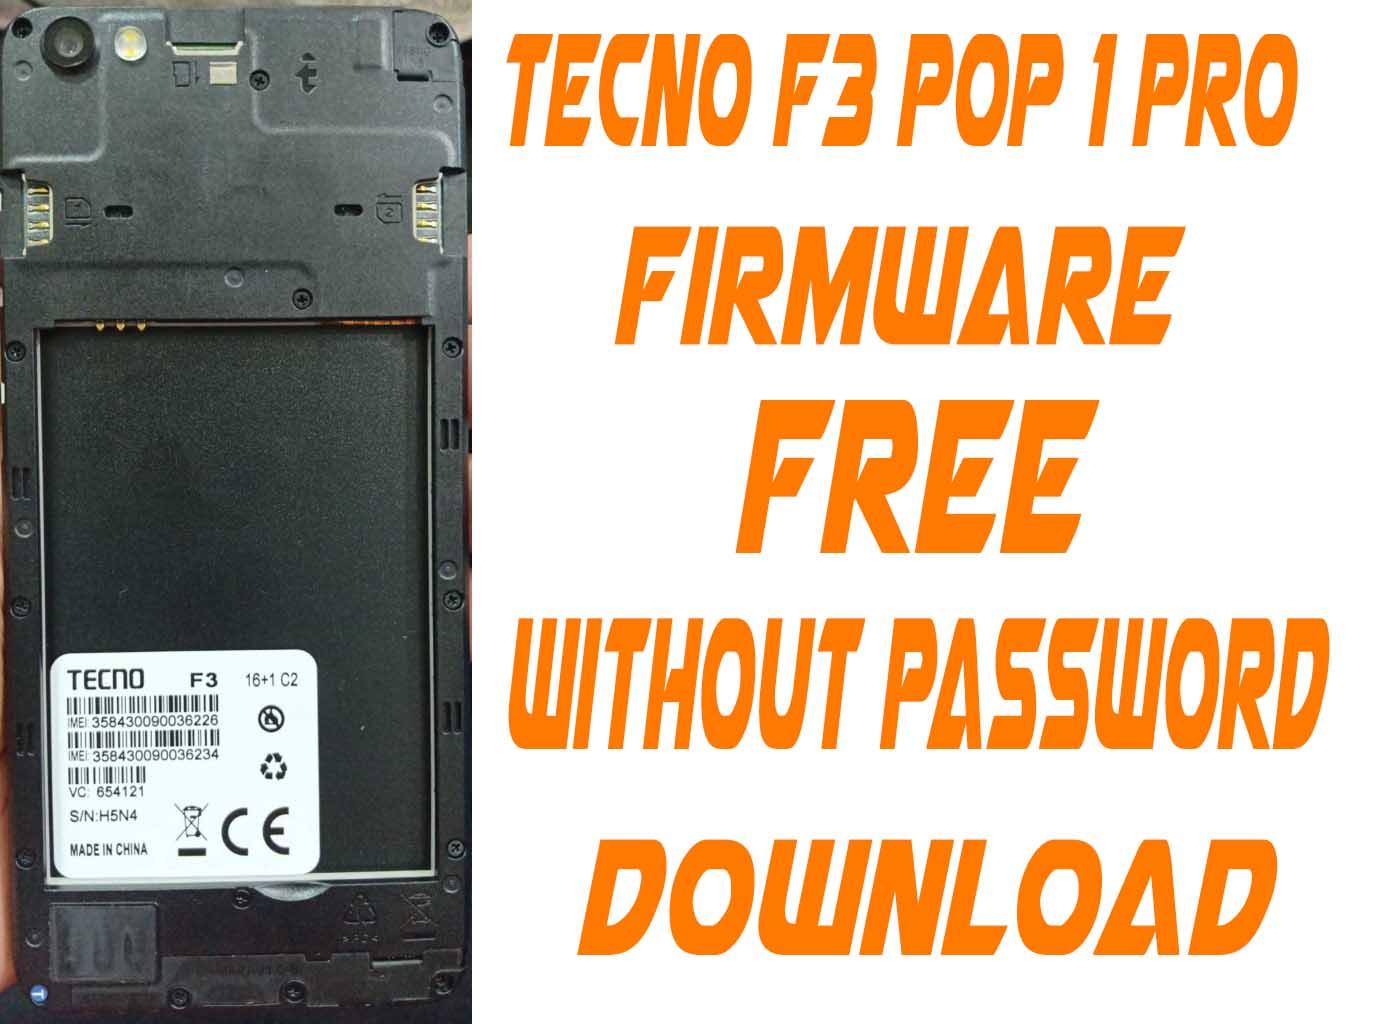 Tecno F3 Pop 1 Pro Firmware Free (Hang Logo Camera Fix Care